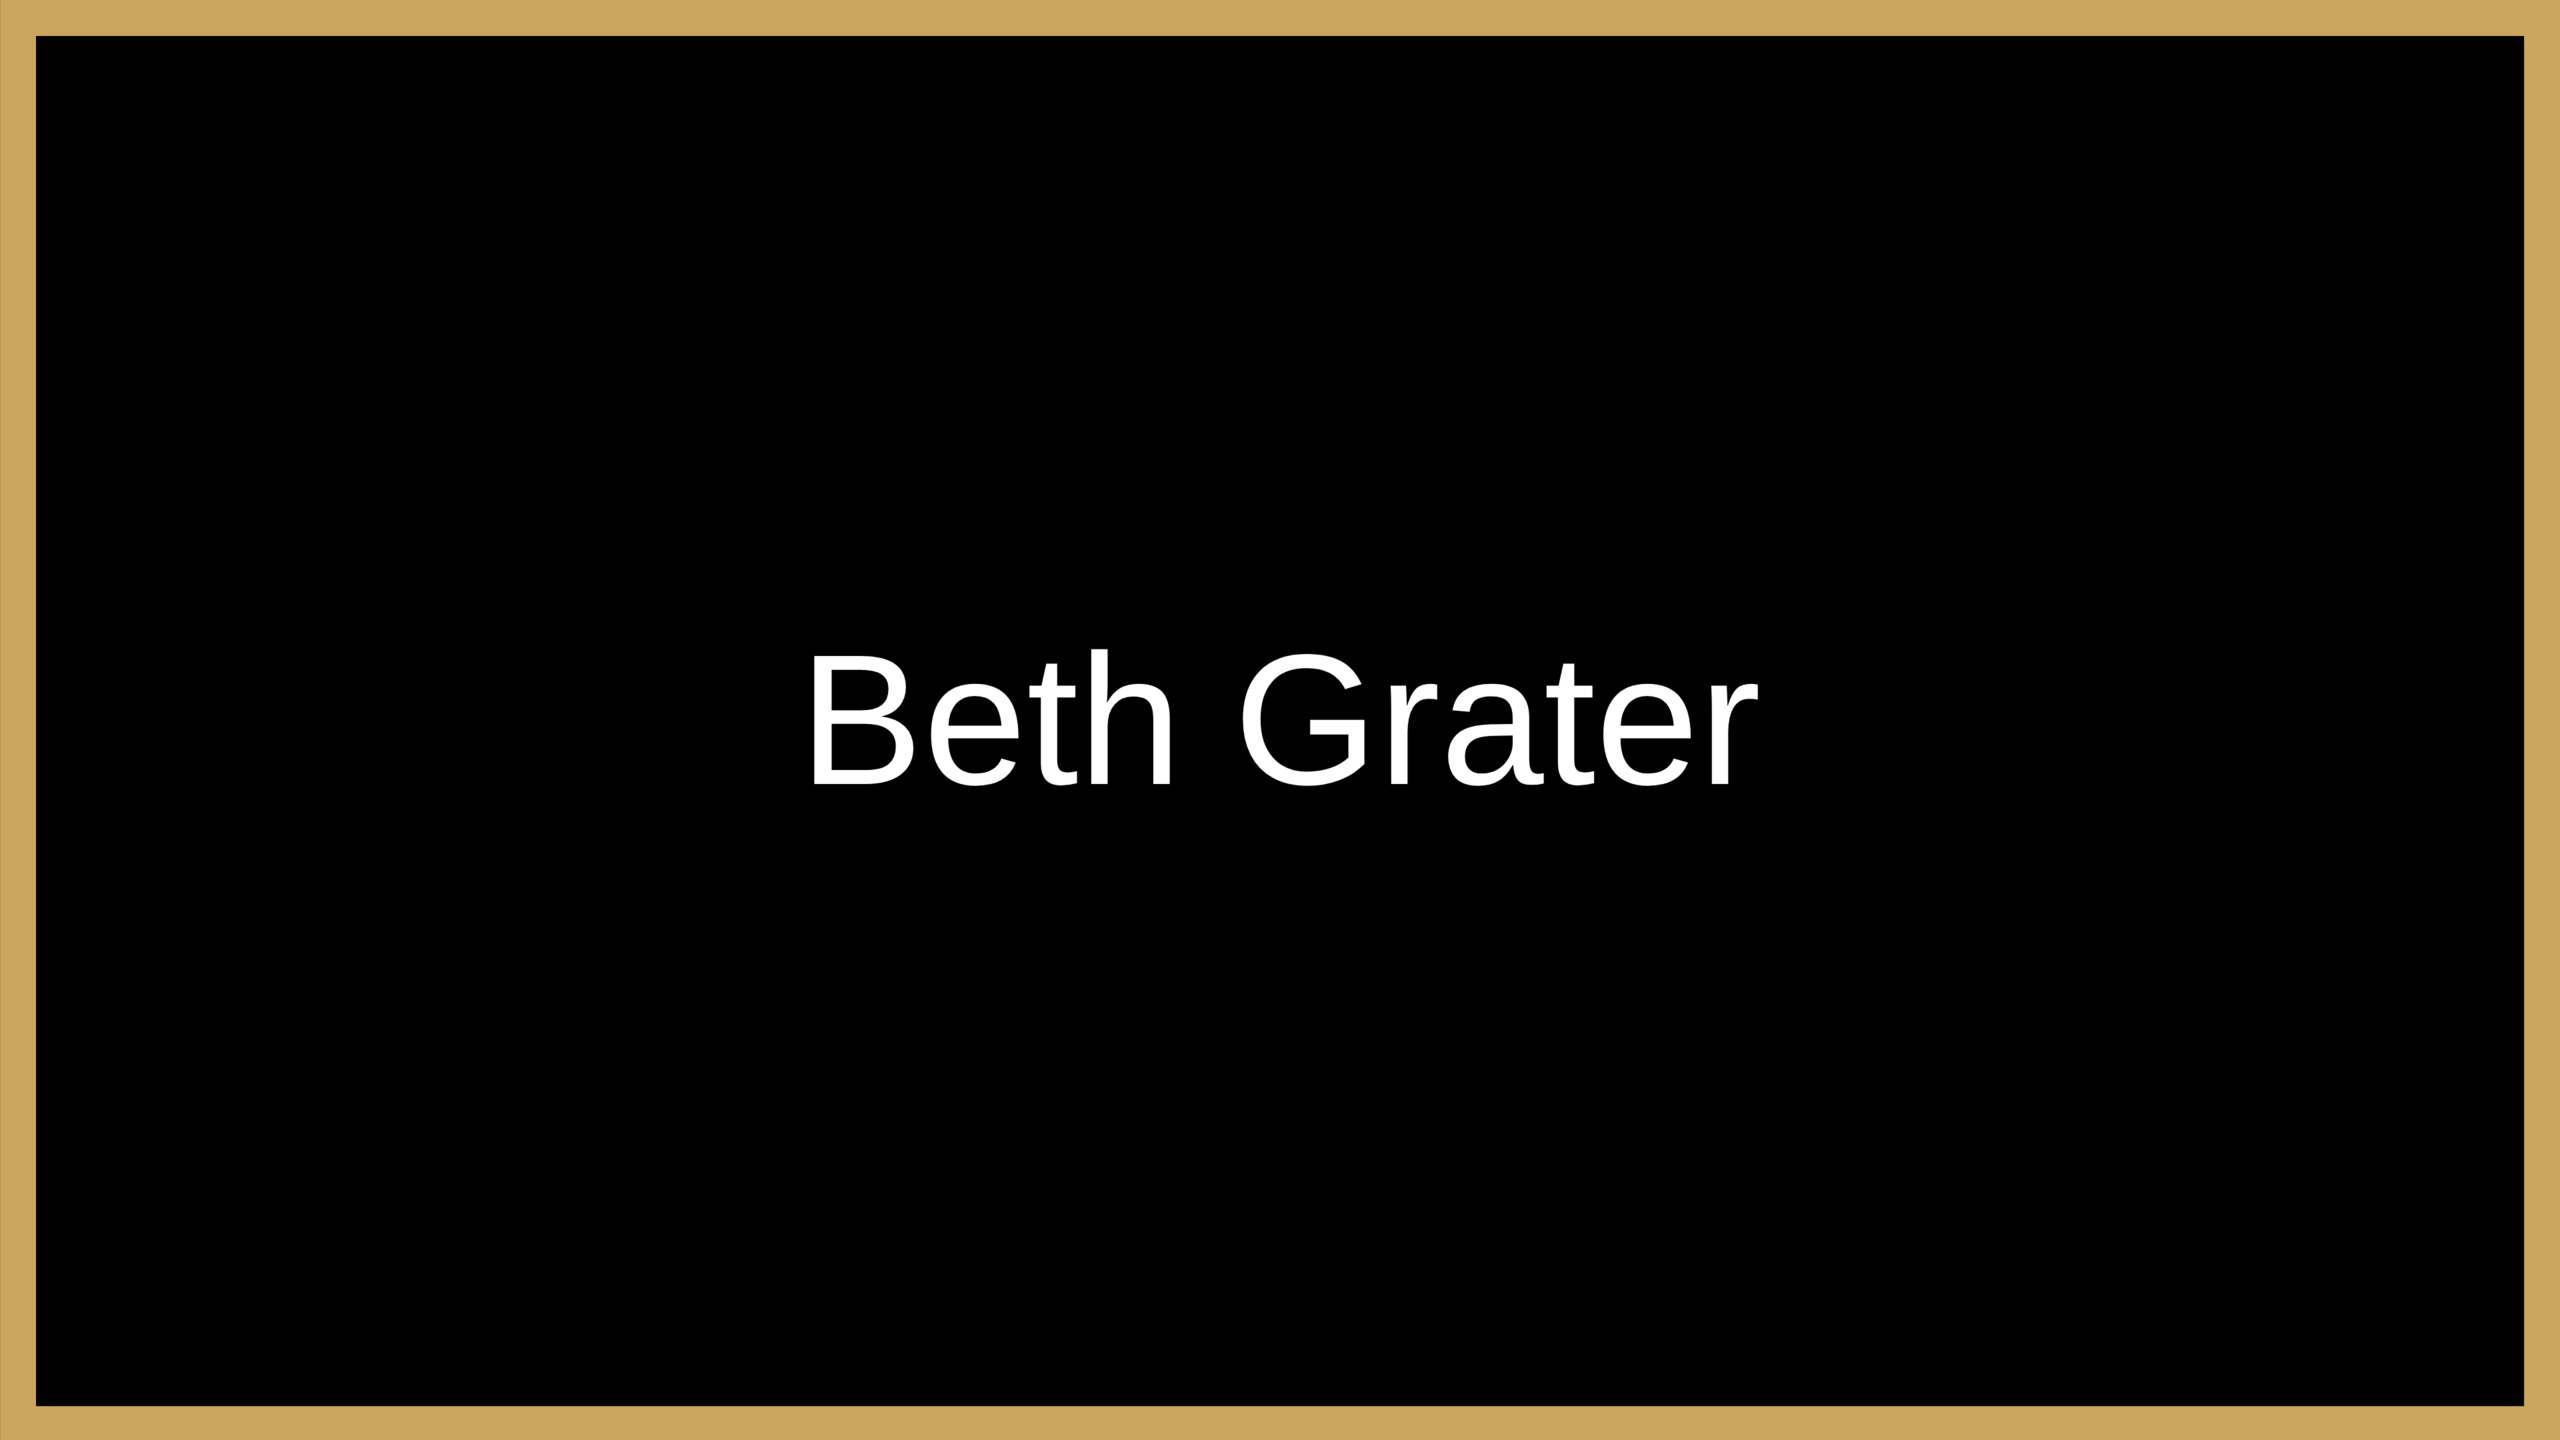 Beth Grater